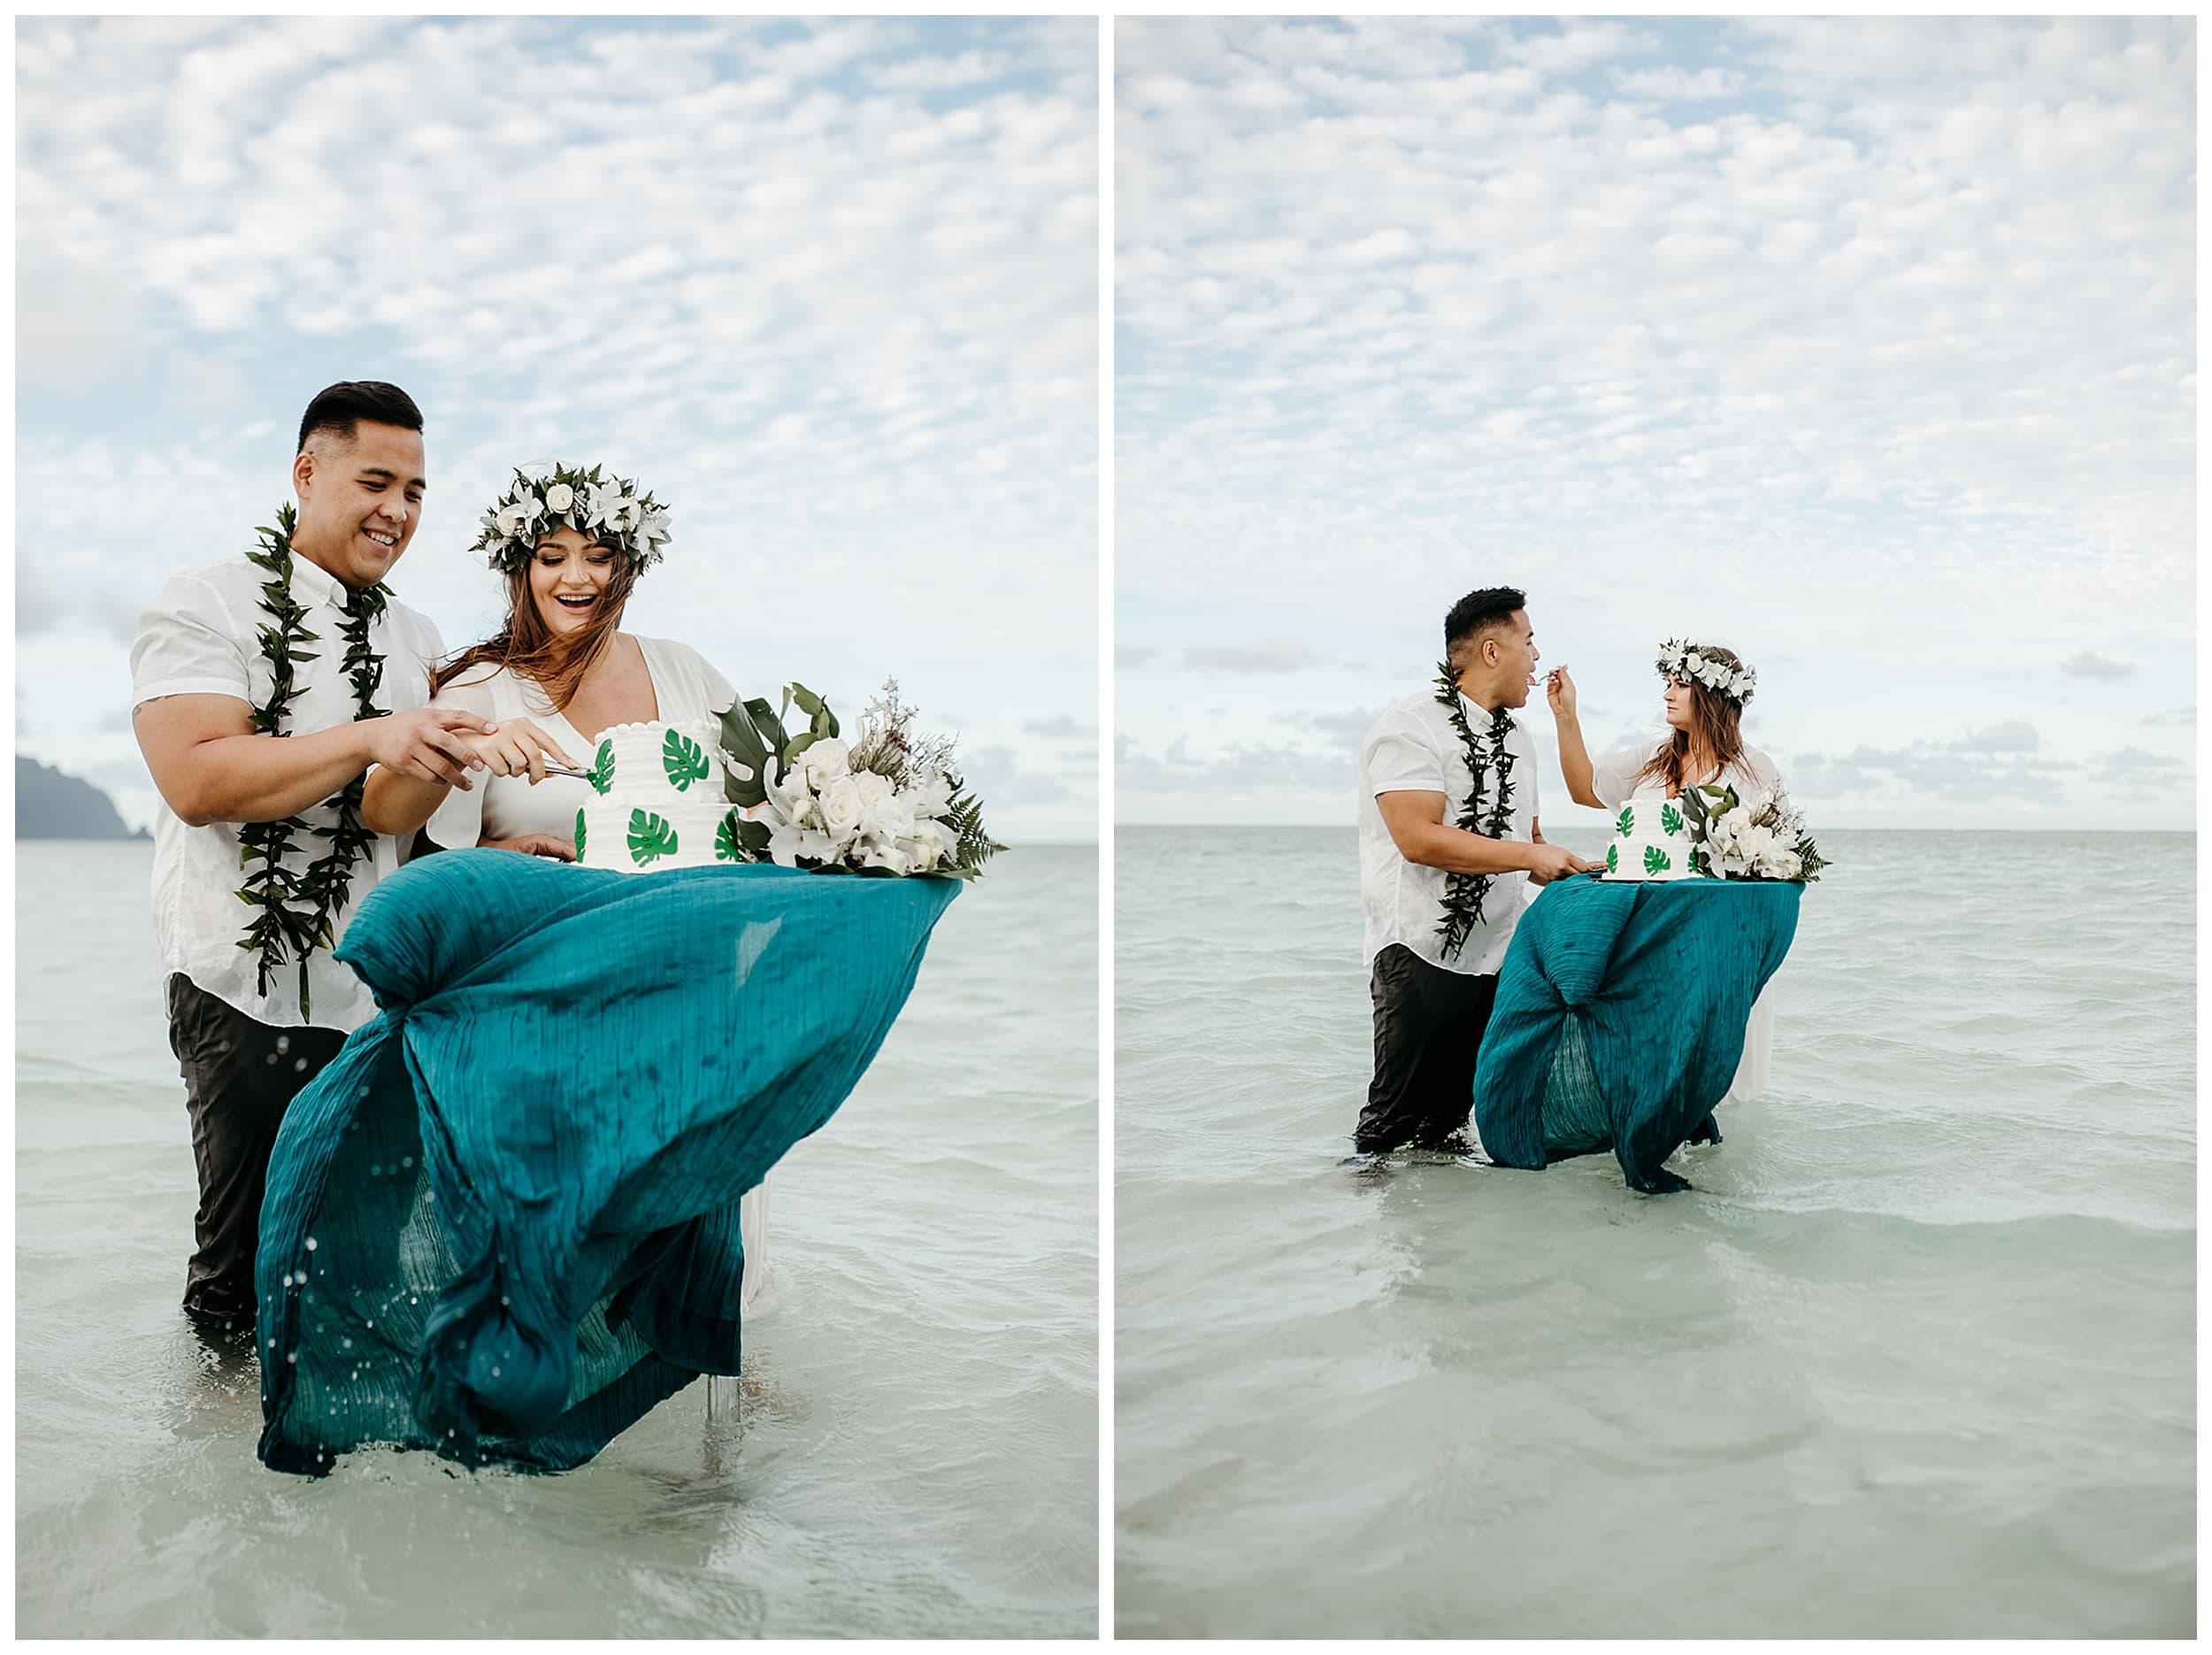 bride and groom cutting cake at Kaneohe Sandbar